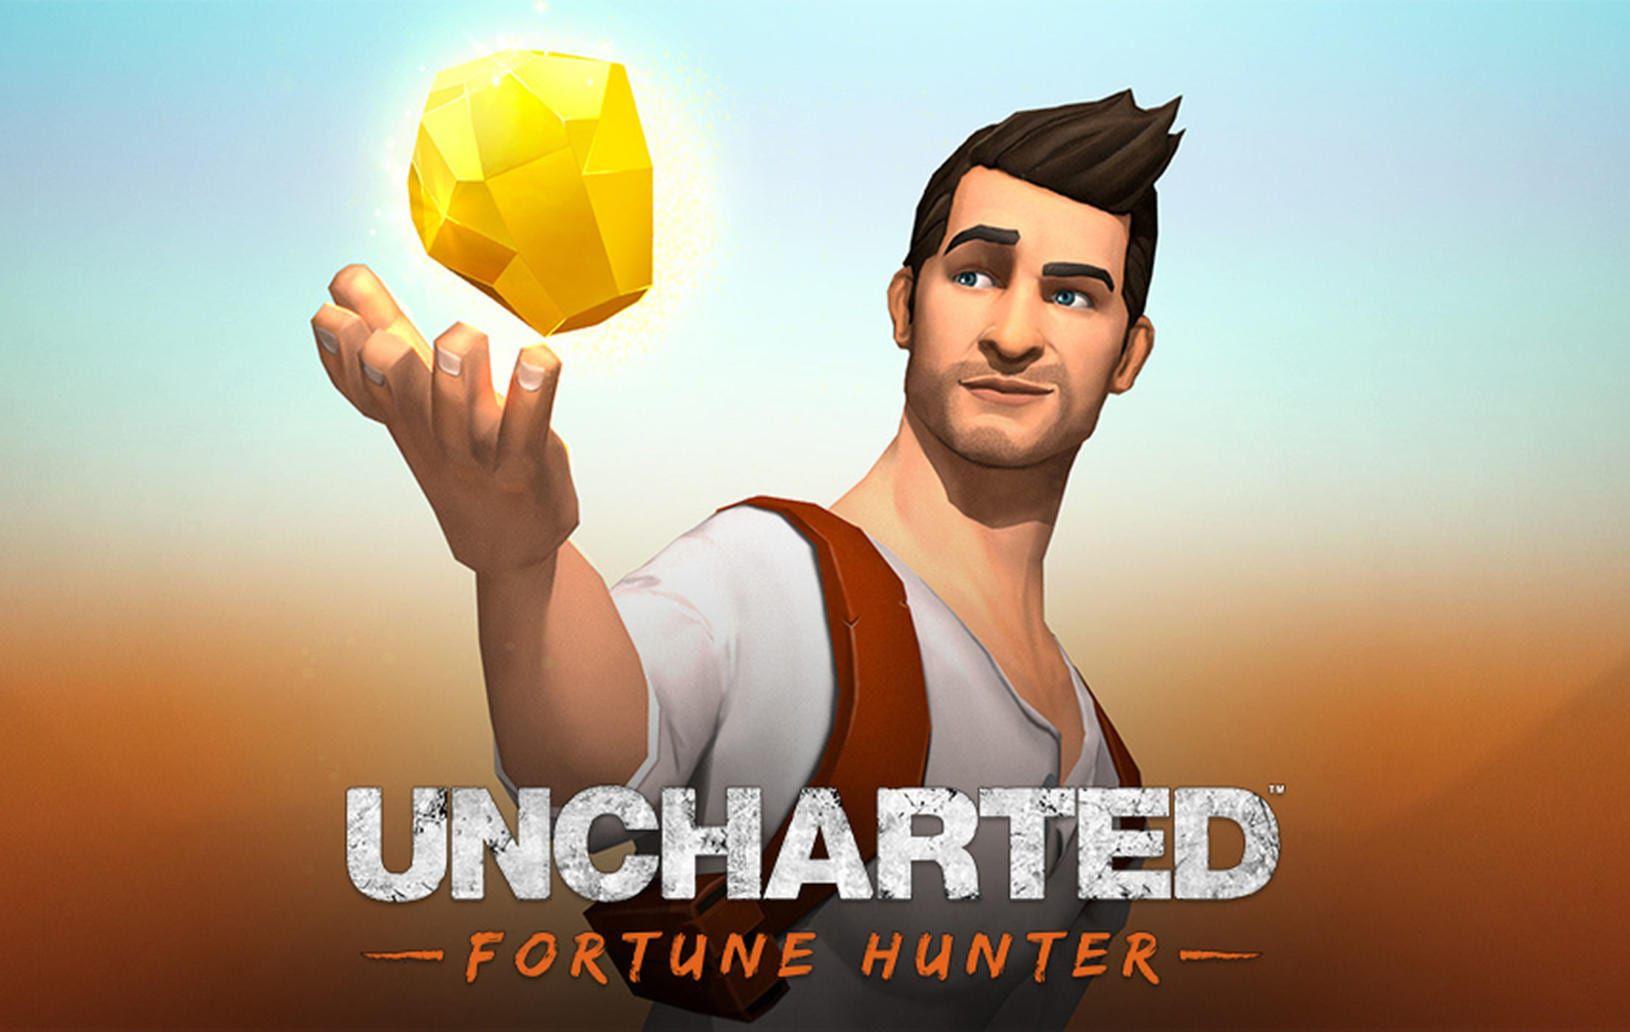 image du jeu Uncharted: Fortune Hunter, de Sony